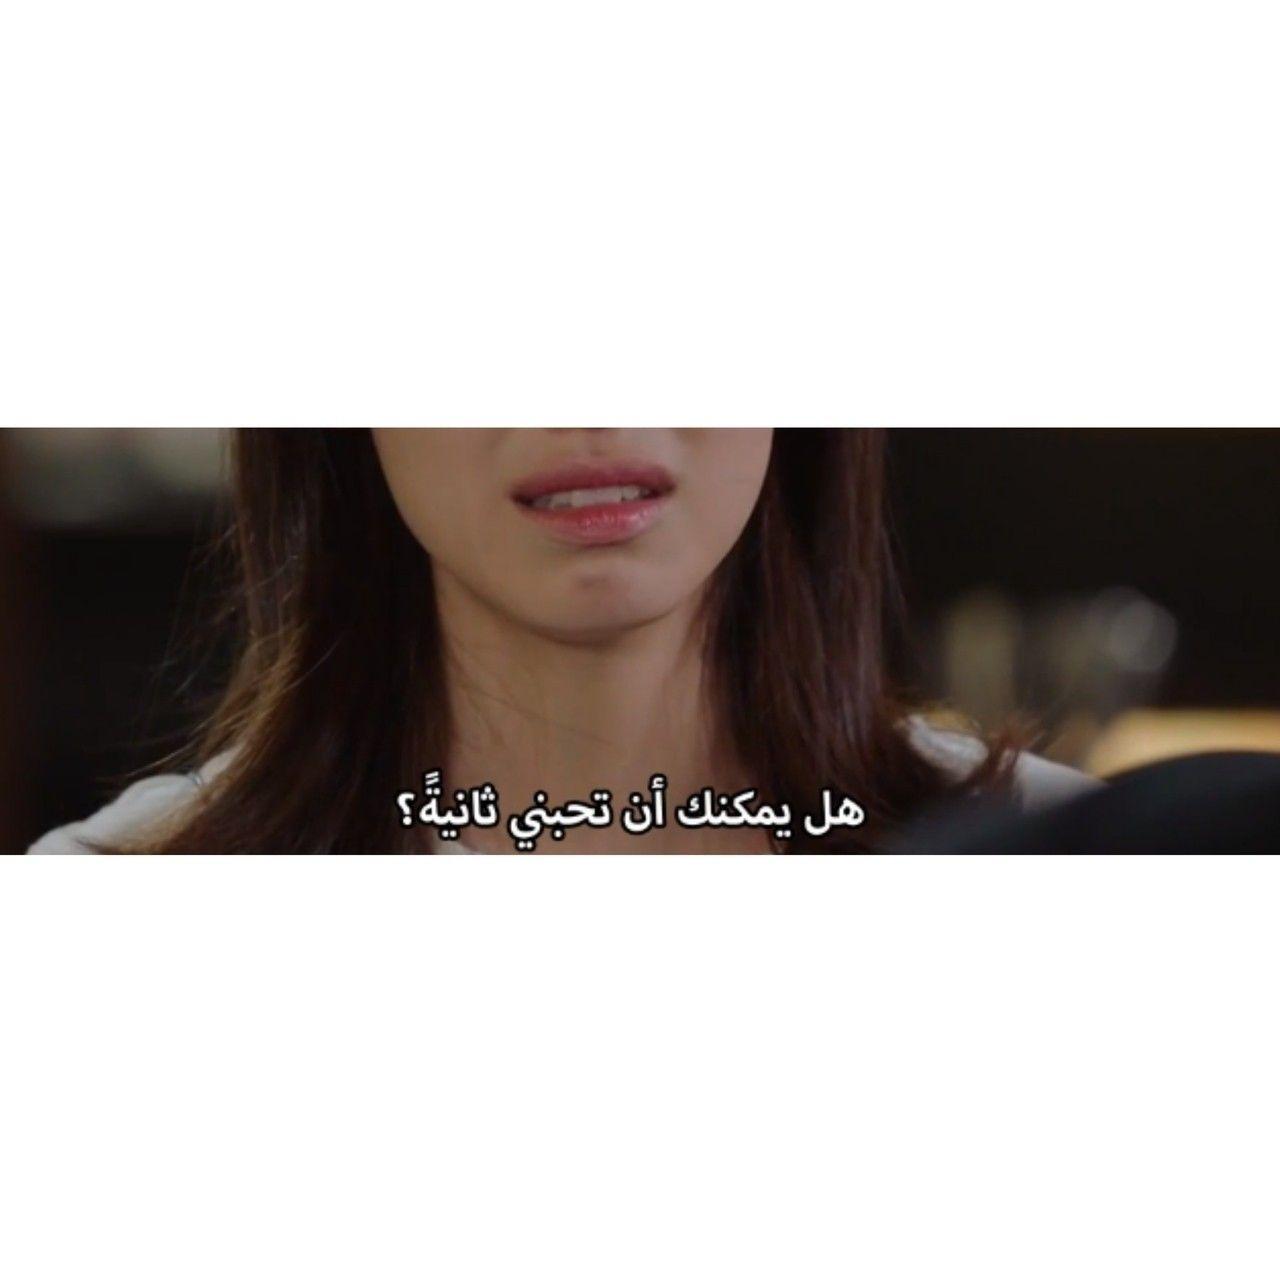 Pin By Zahra Benrachid On اقتباسات مسلسلات Beautiful Arabic Words Arabic Quotes Great Quotes